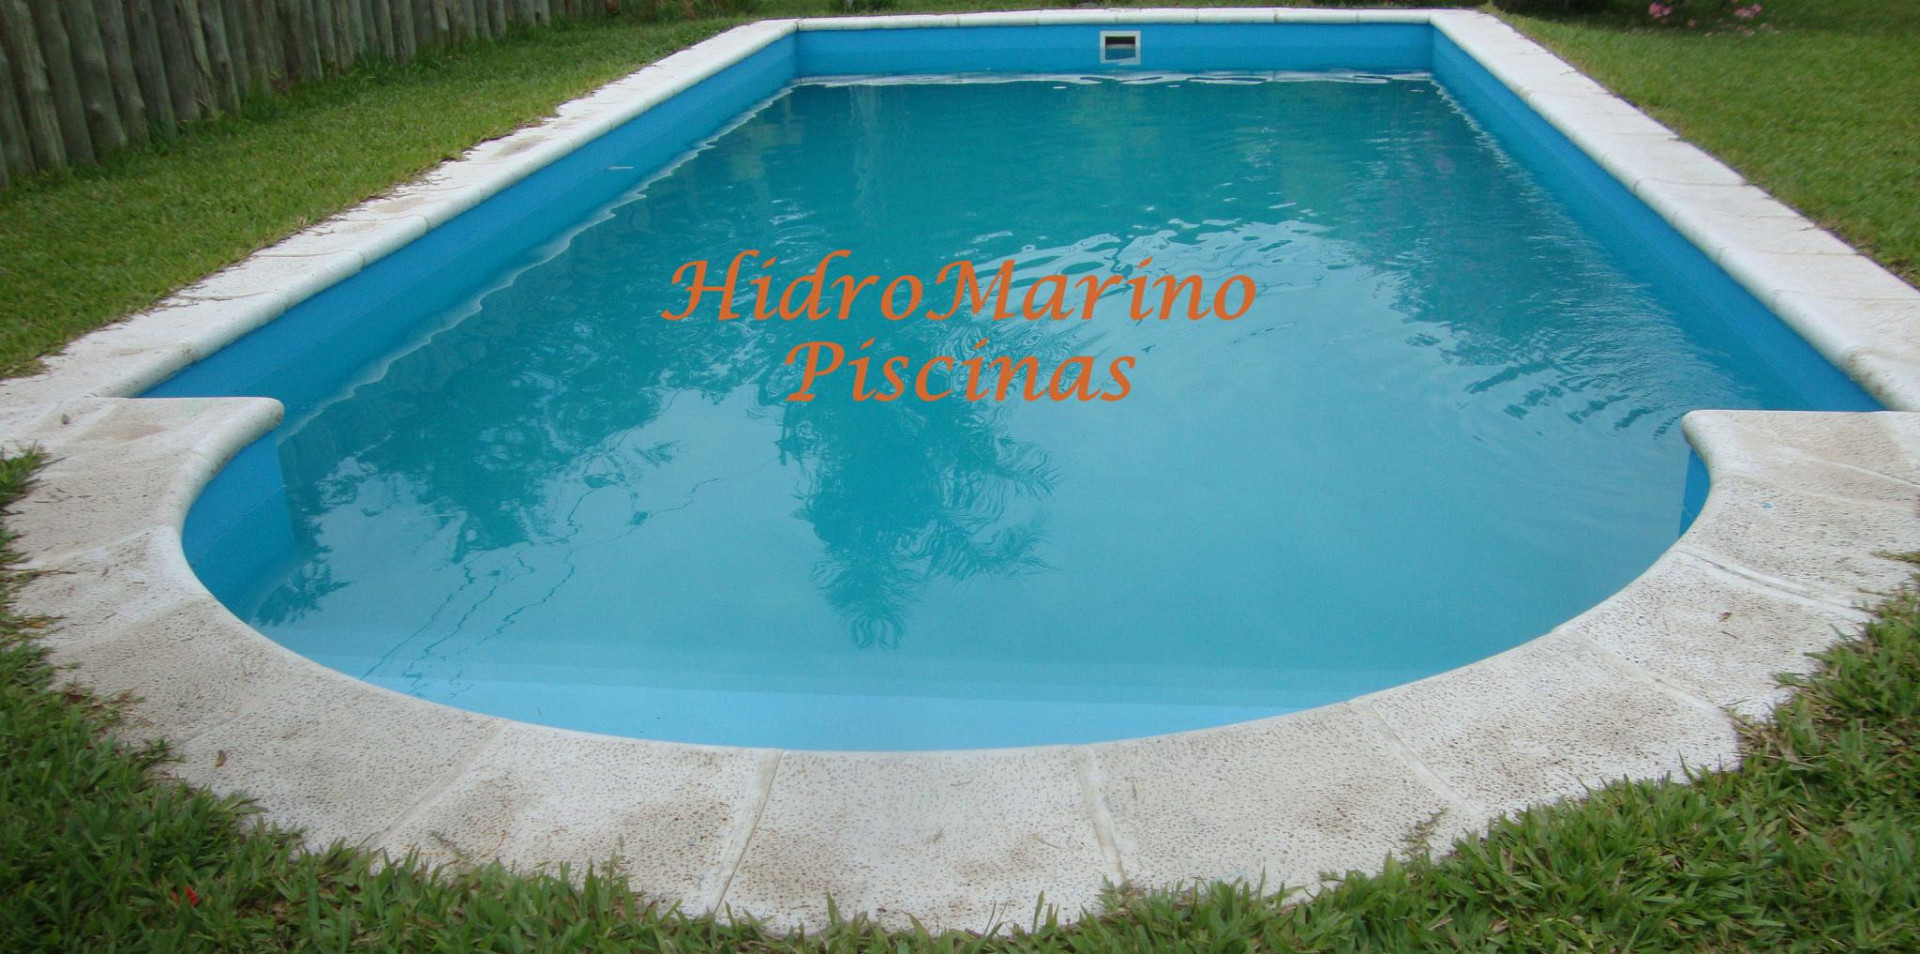 Inicio hidromarino fabrica de piscinas e hidromasajes spa for Fabrica de piscinas